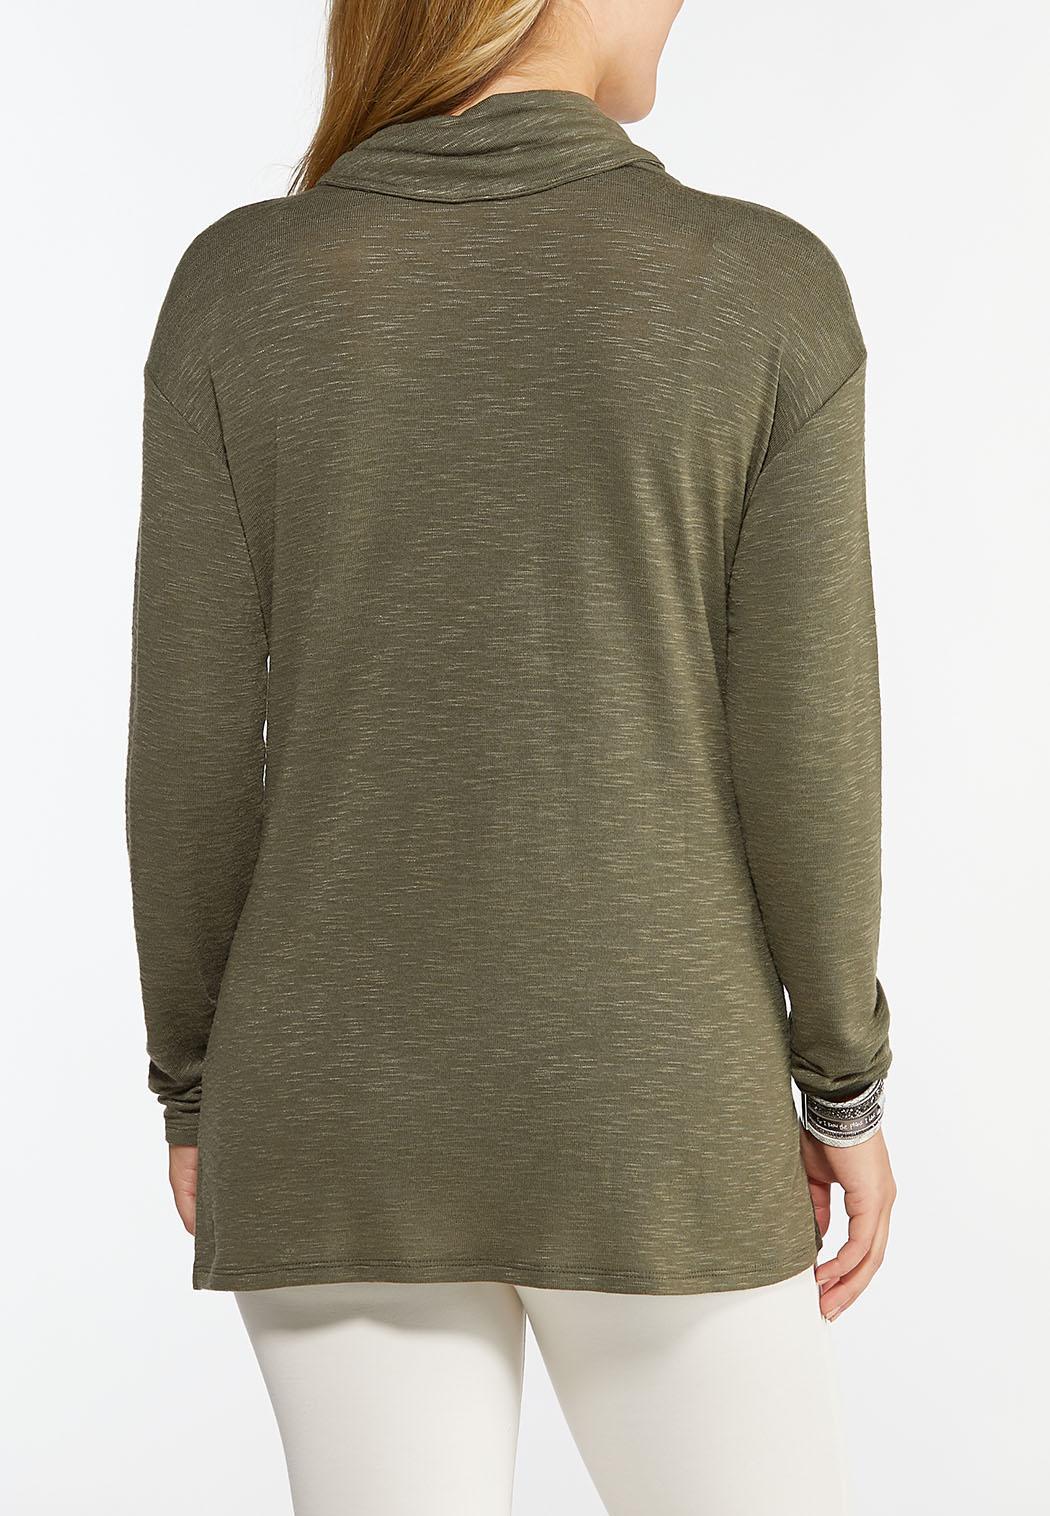 Button Cowl Neck Top (Item #44425147)